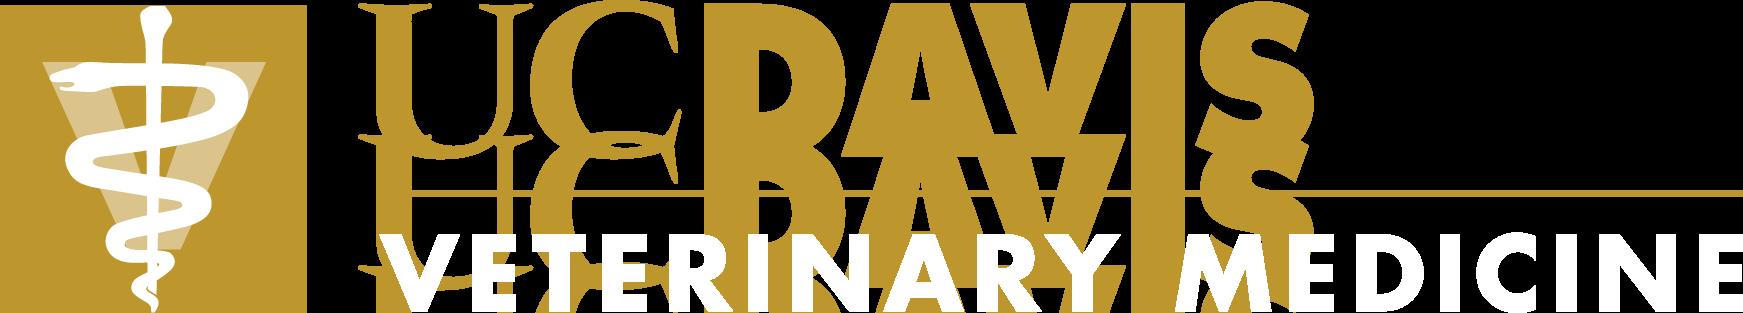 Images of Uc Davis Calendar Spring 2021